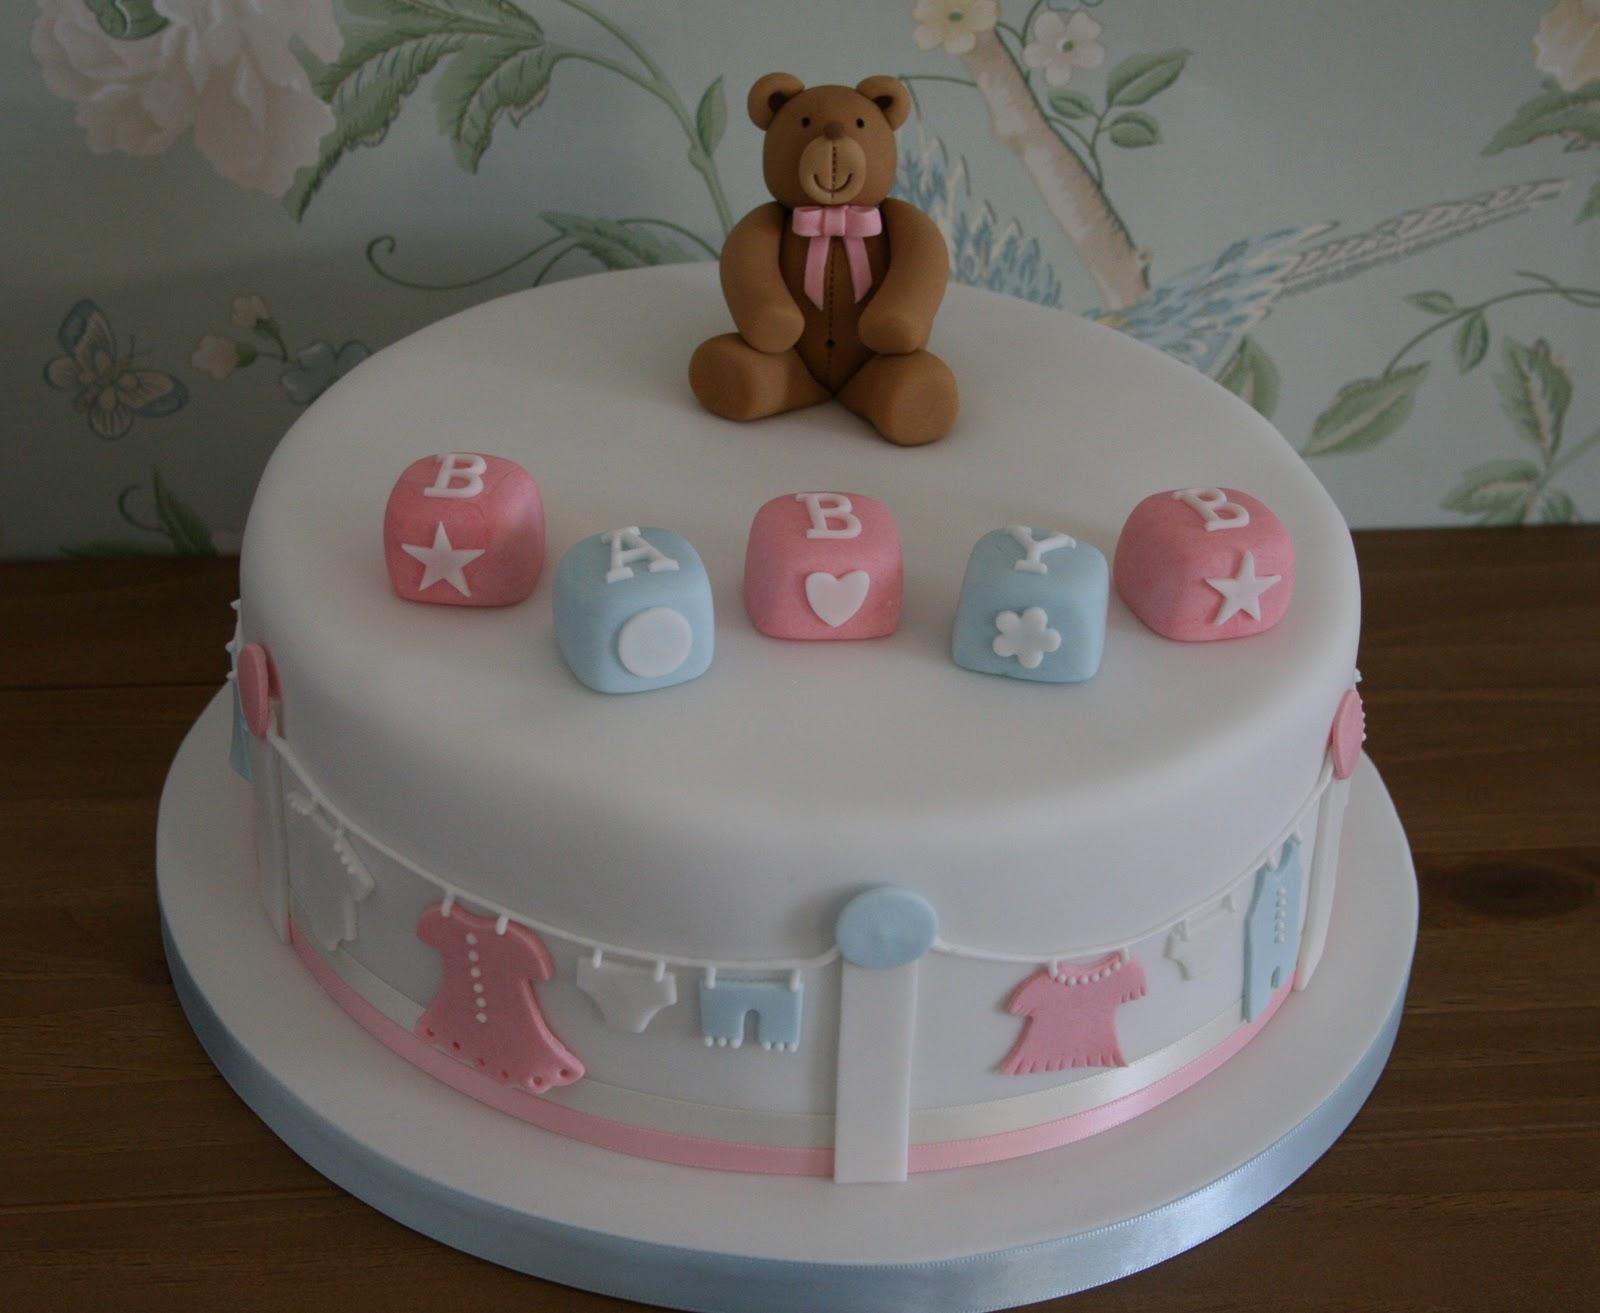 Cute-Baby-Shower-Cake-Ideas.jpg